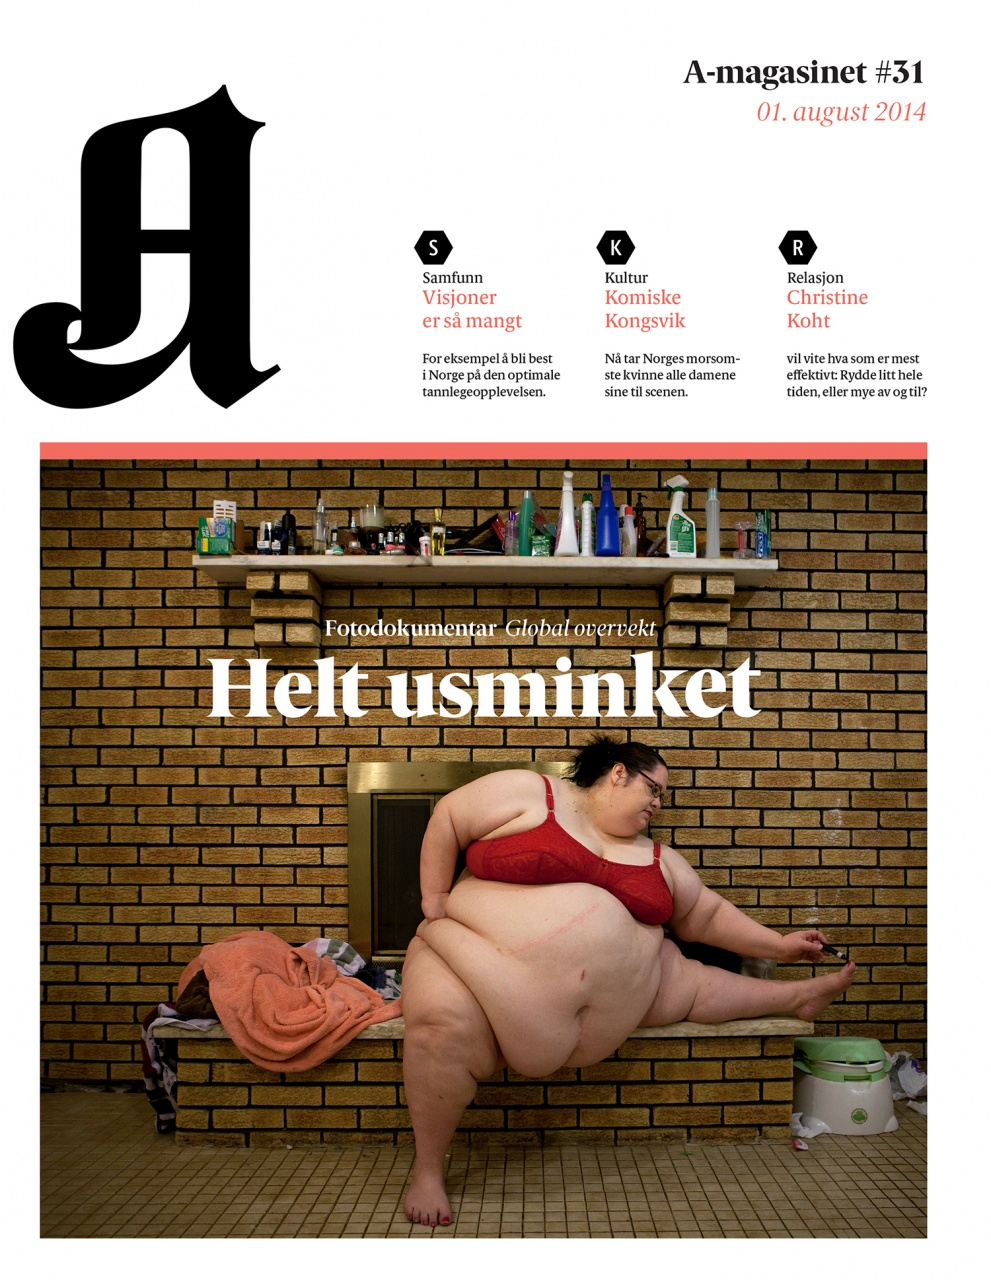 Publication in A-Magasinet - Aftenposten (Norway)